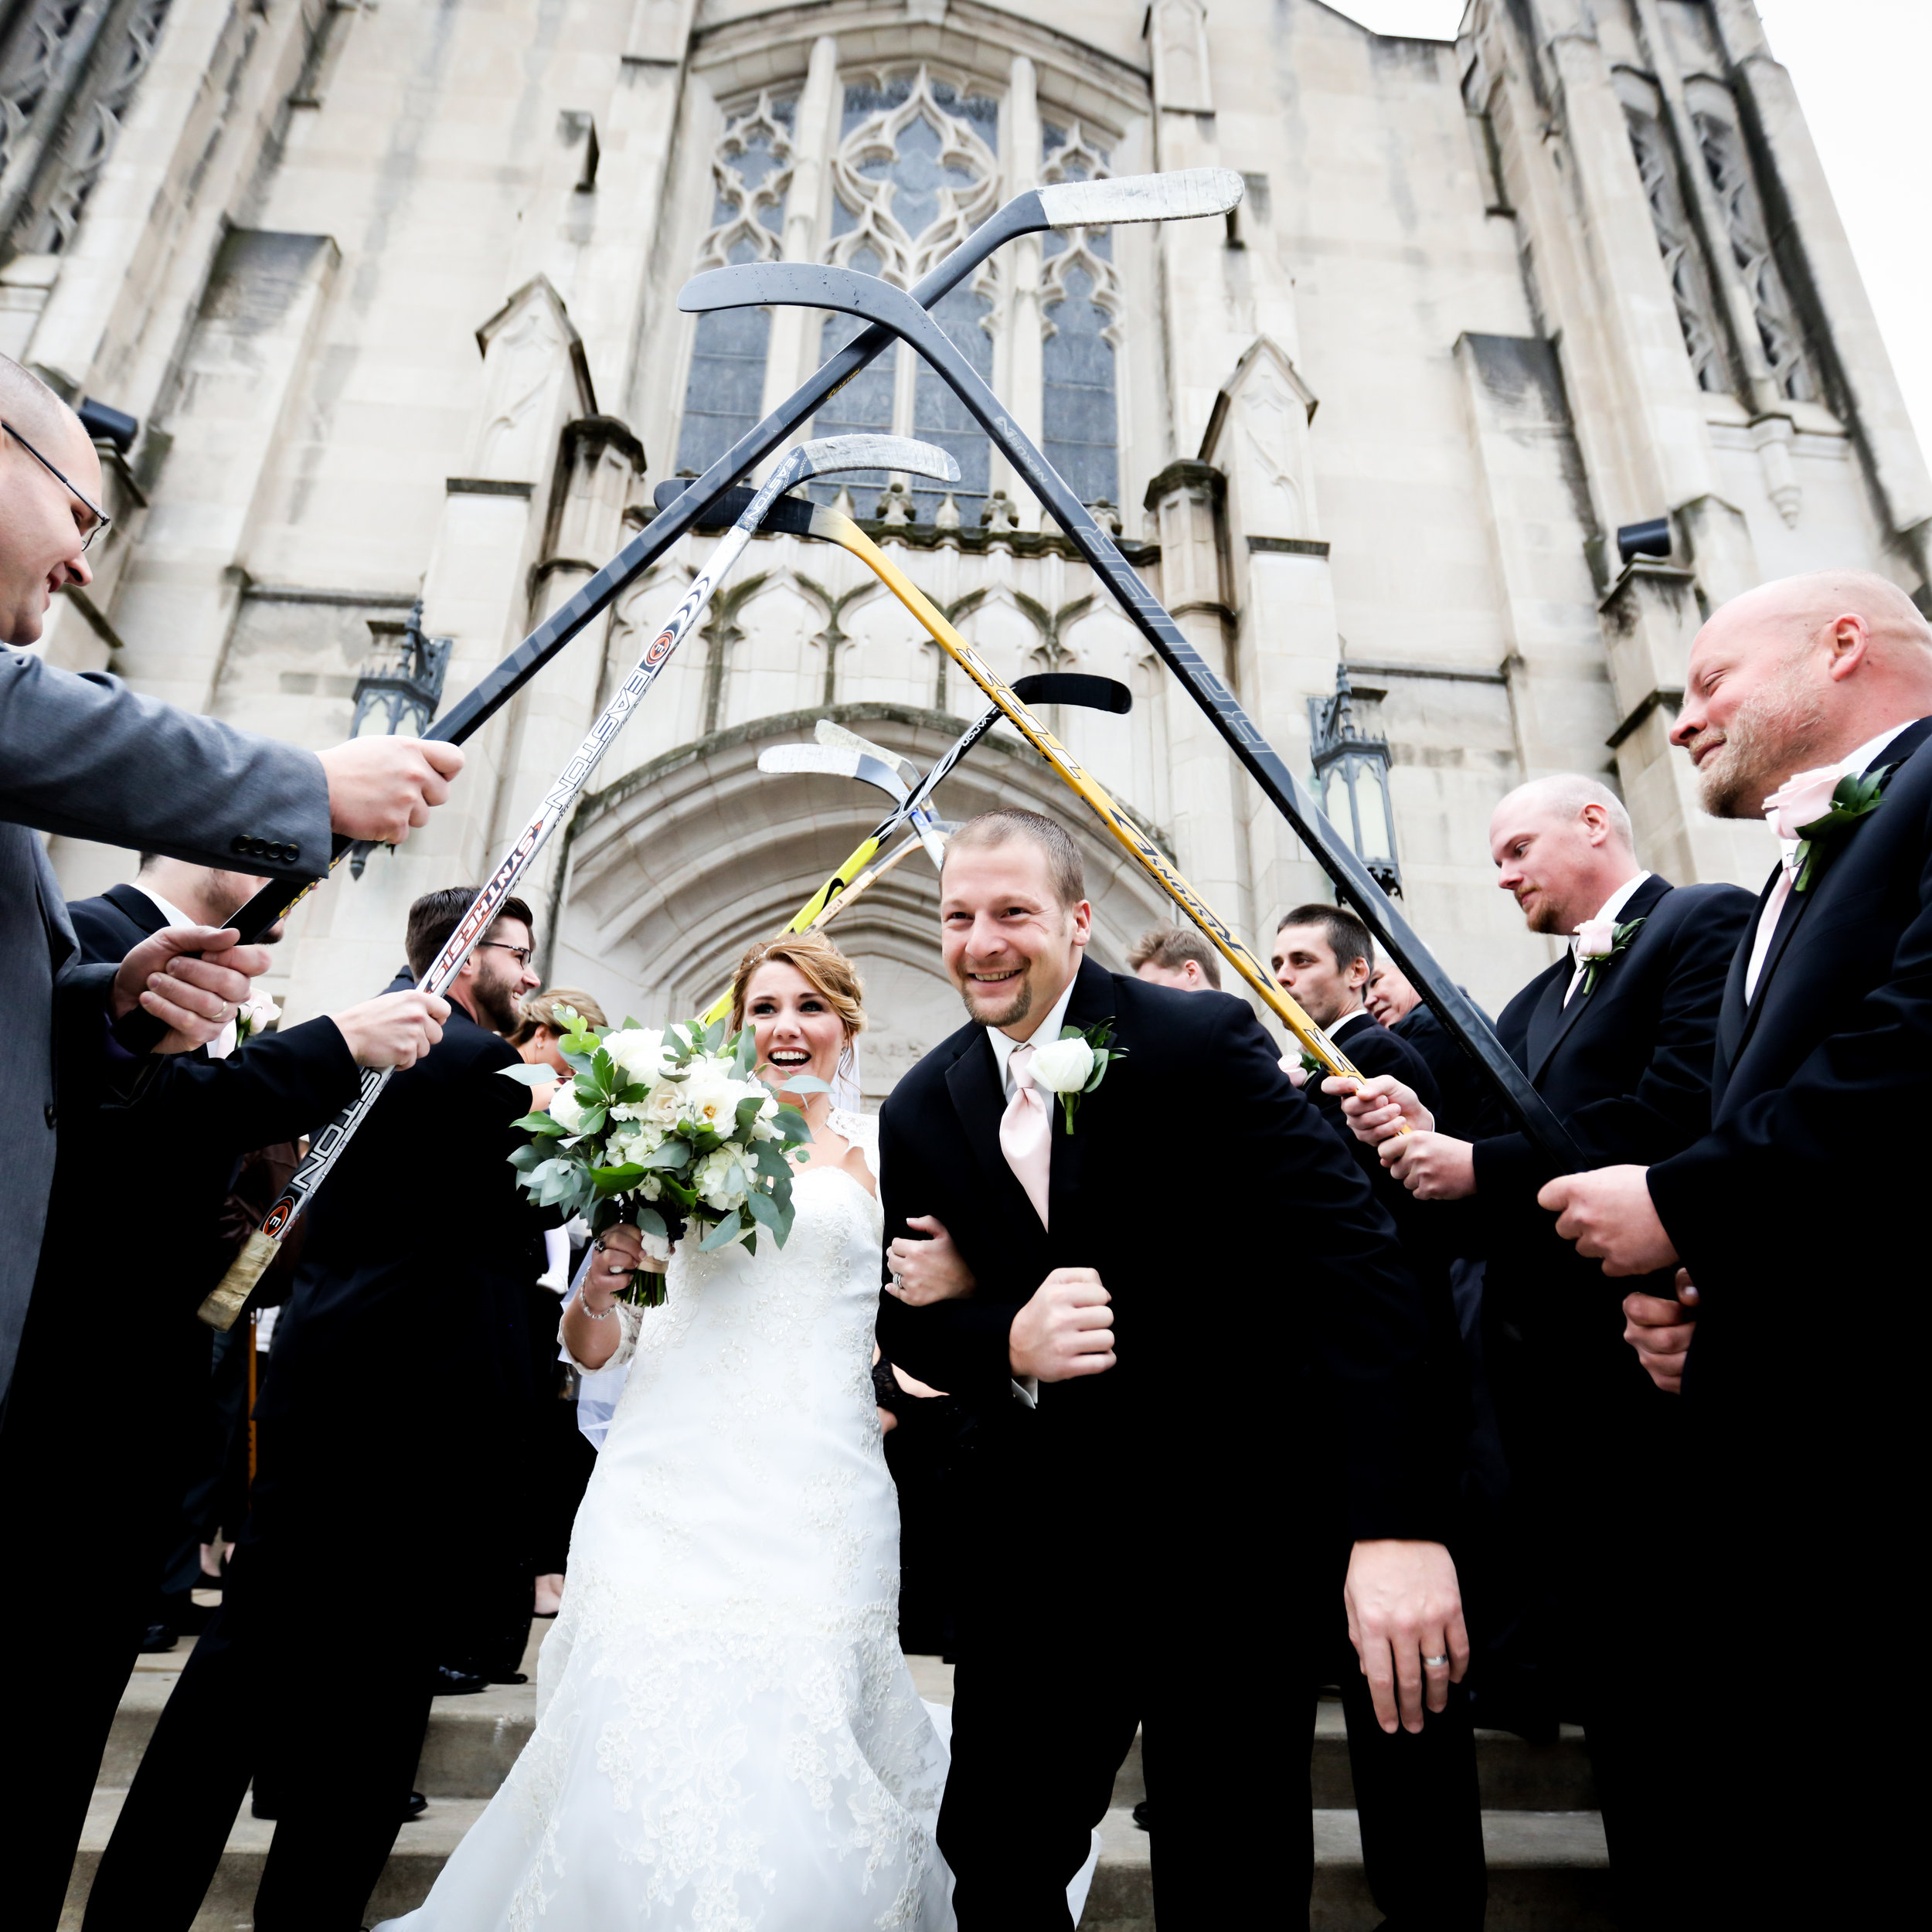 WeddingWebsite-97.jpg